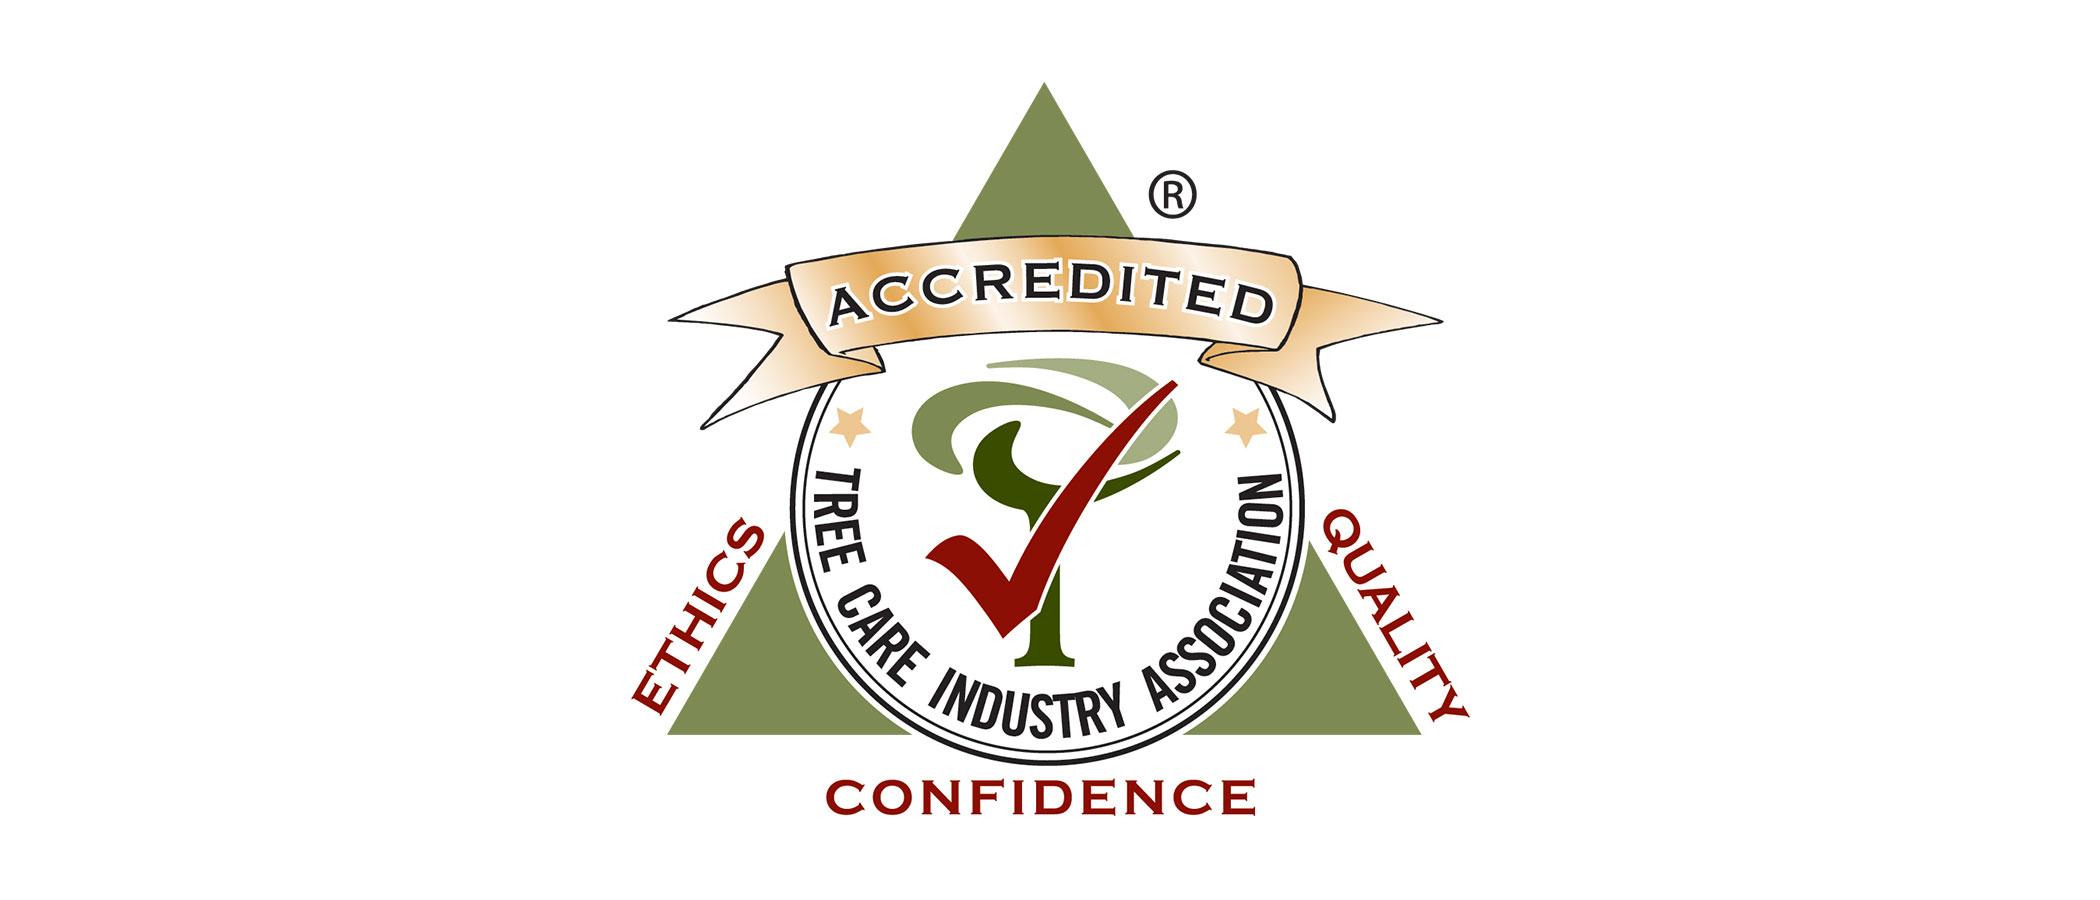 Selner tree shrub care home tcia accreditation logo malvernweather Choice Image